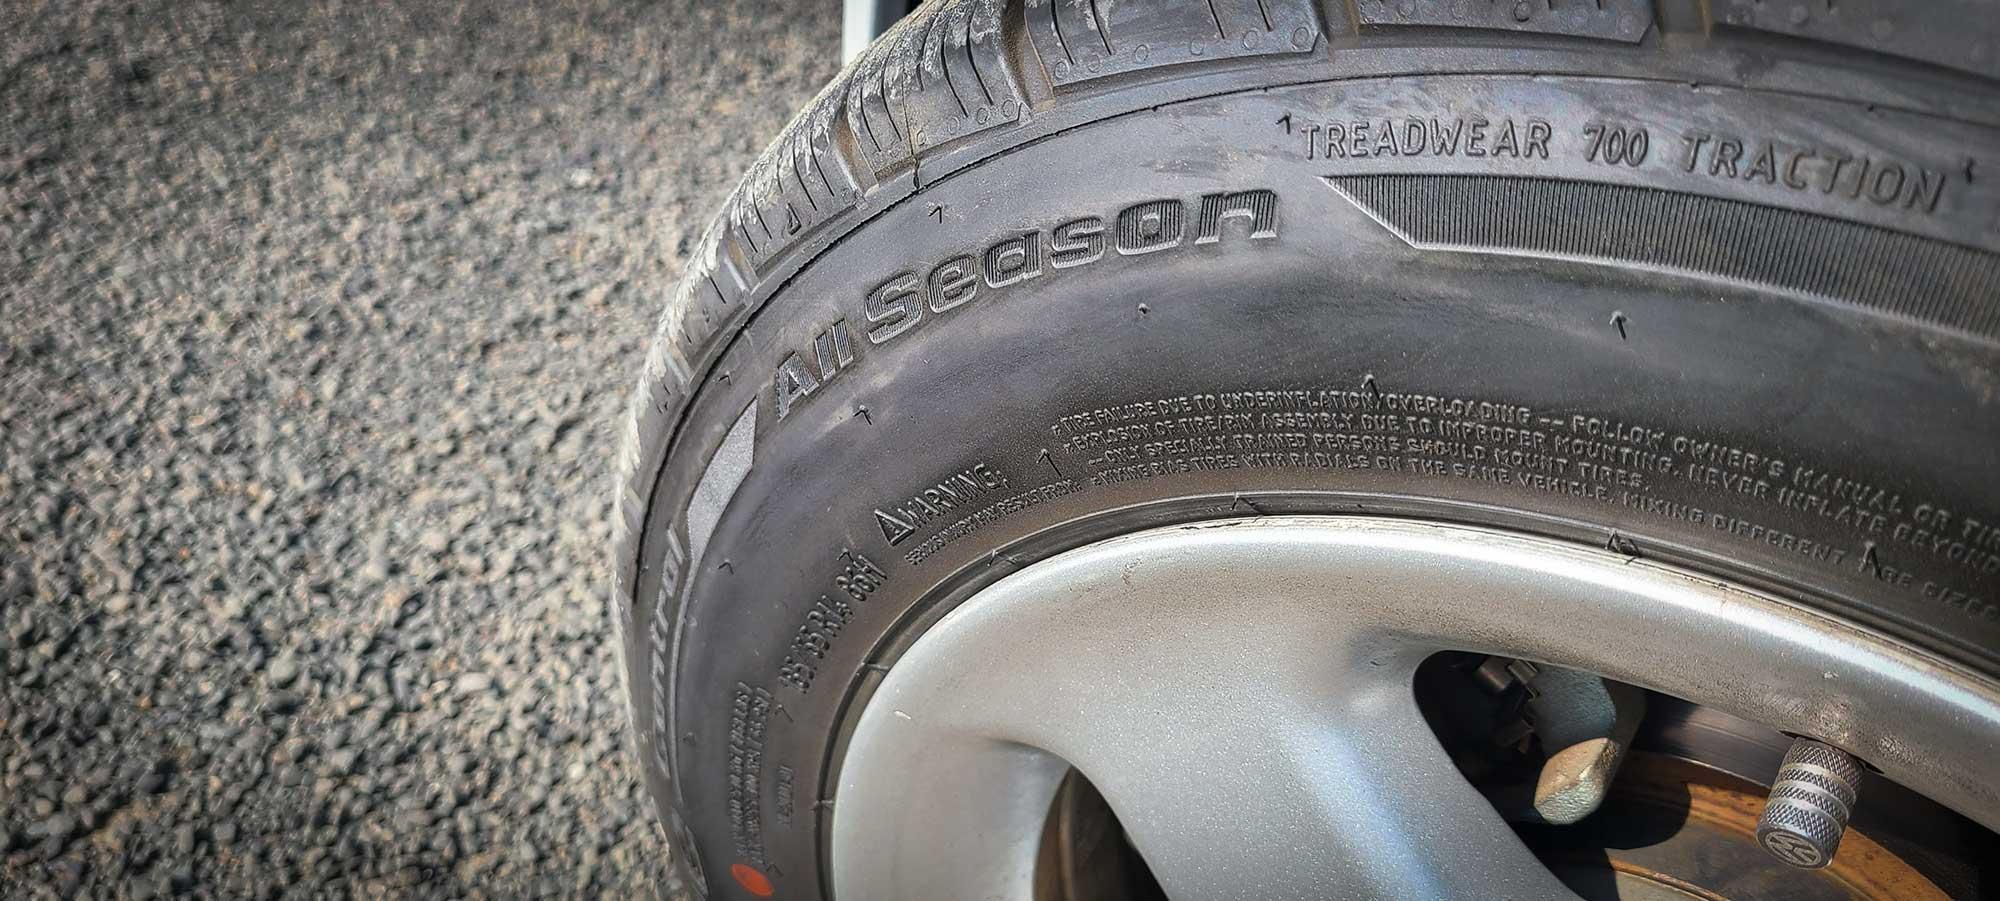 All-season BFGoodrich tire